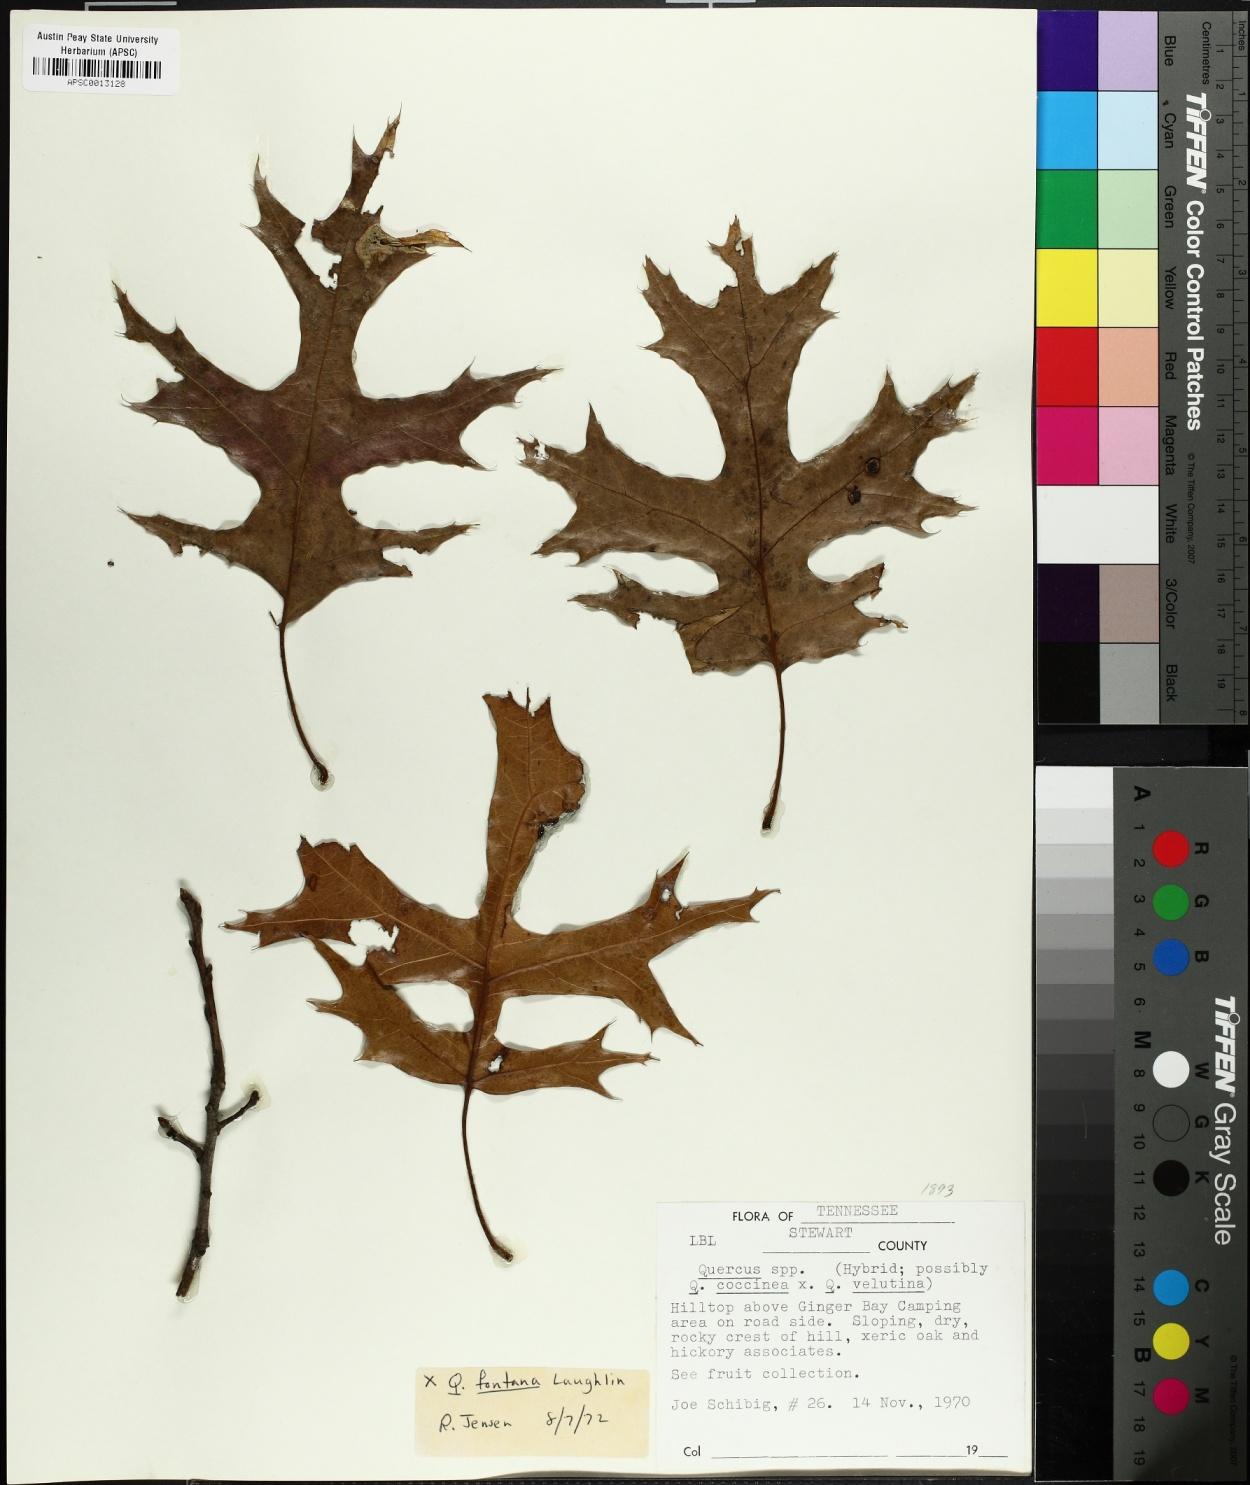 Quercus × fontana image